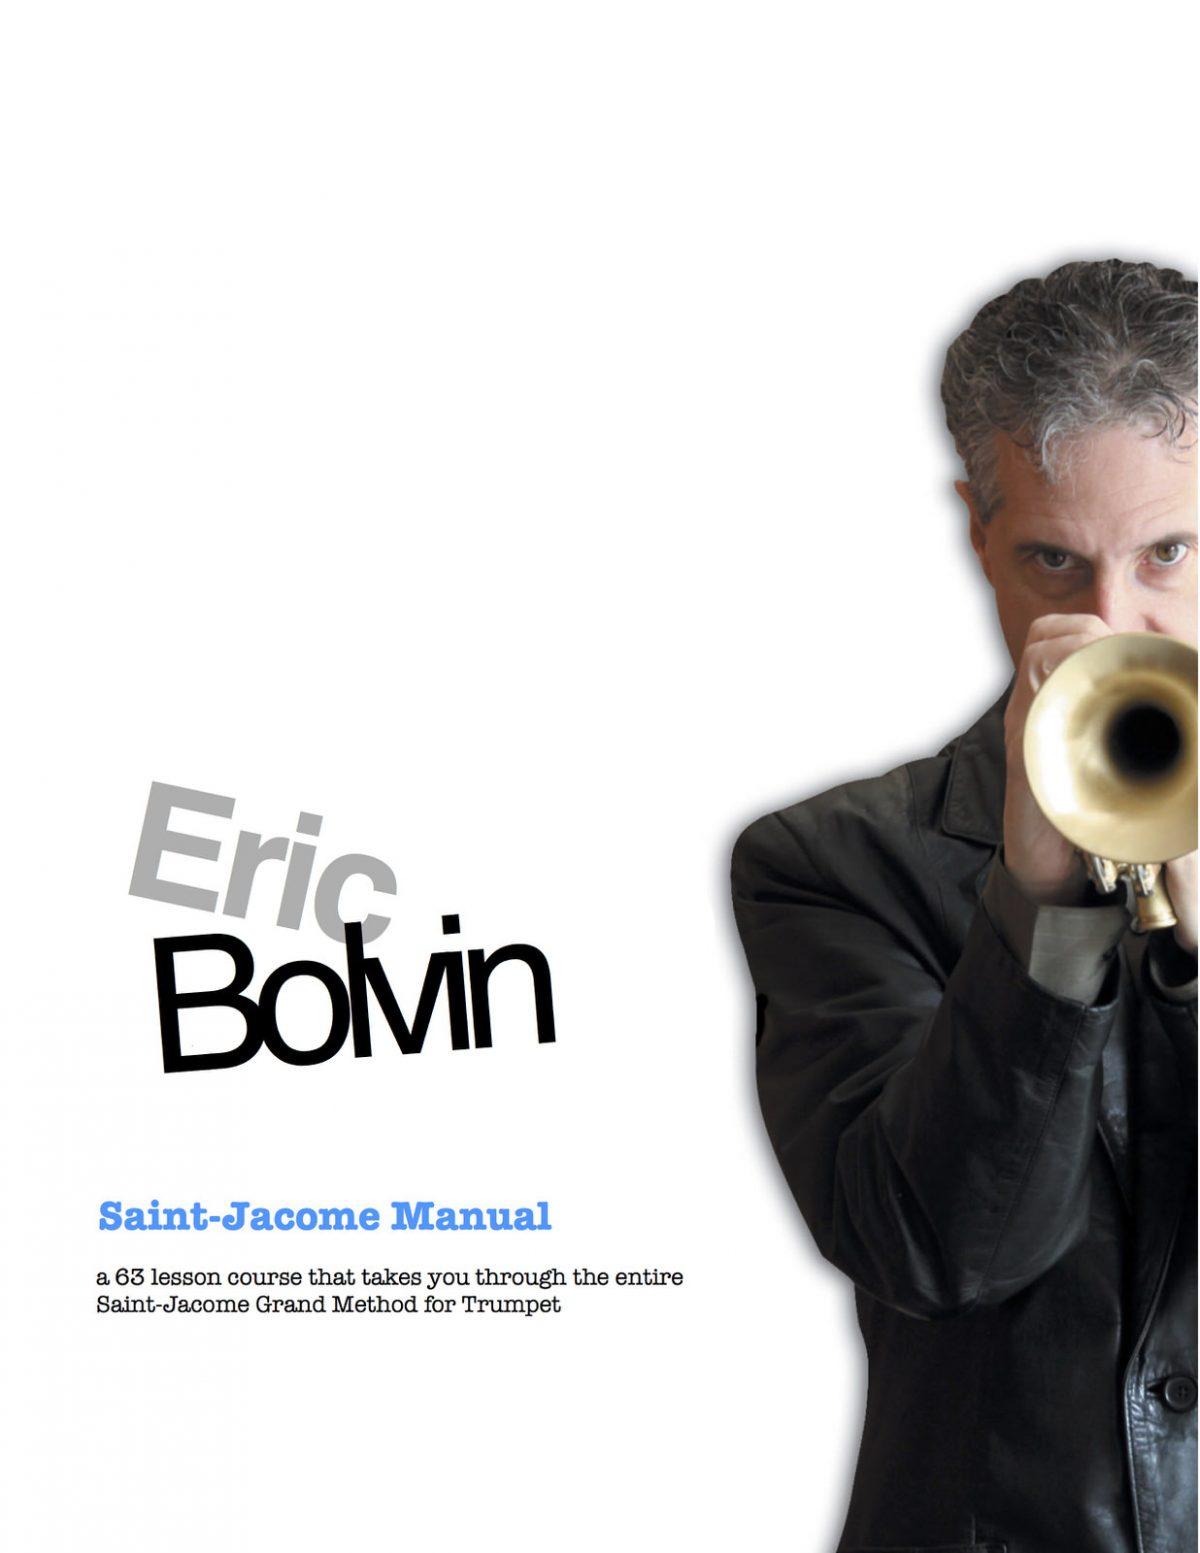 Bolvin, Saint-Jacome Manual